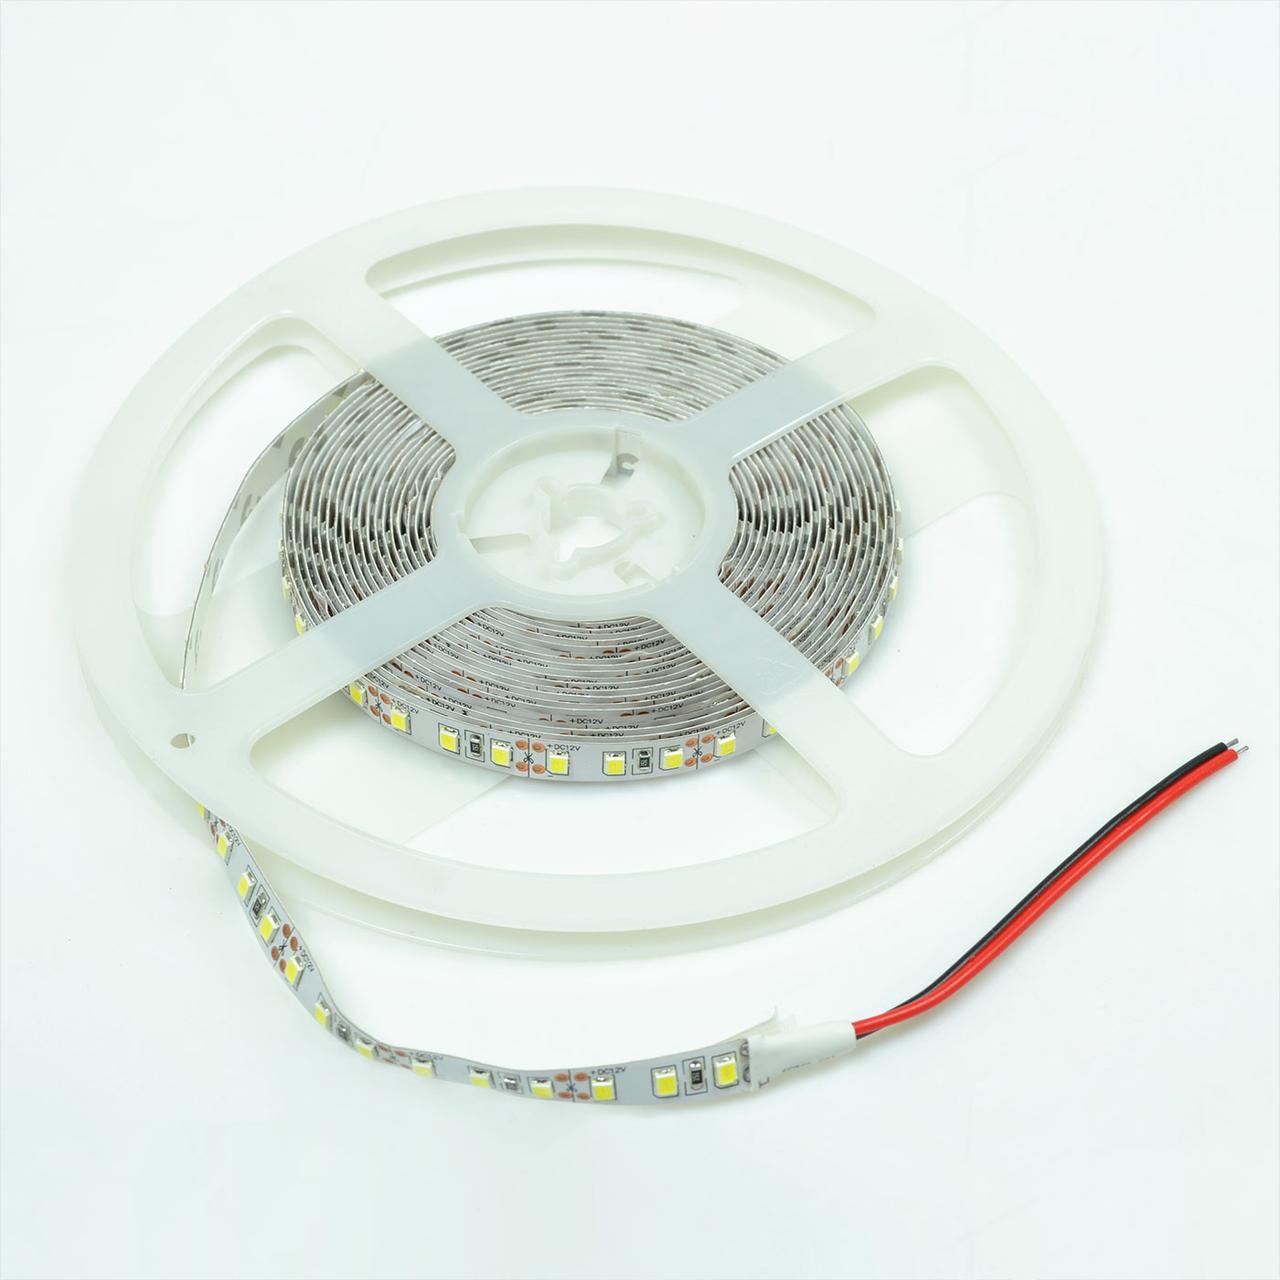 Светодиодная лента Venom SMD 2835 120д.м. nano (IP67) Premium (VP-2835121201-W)